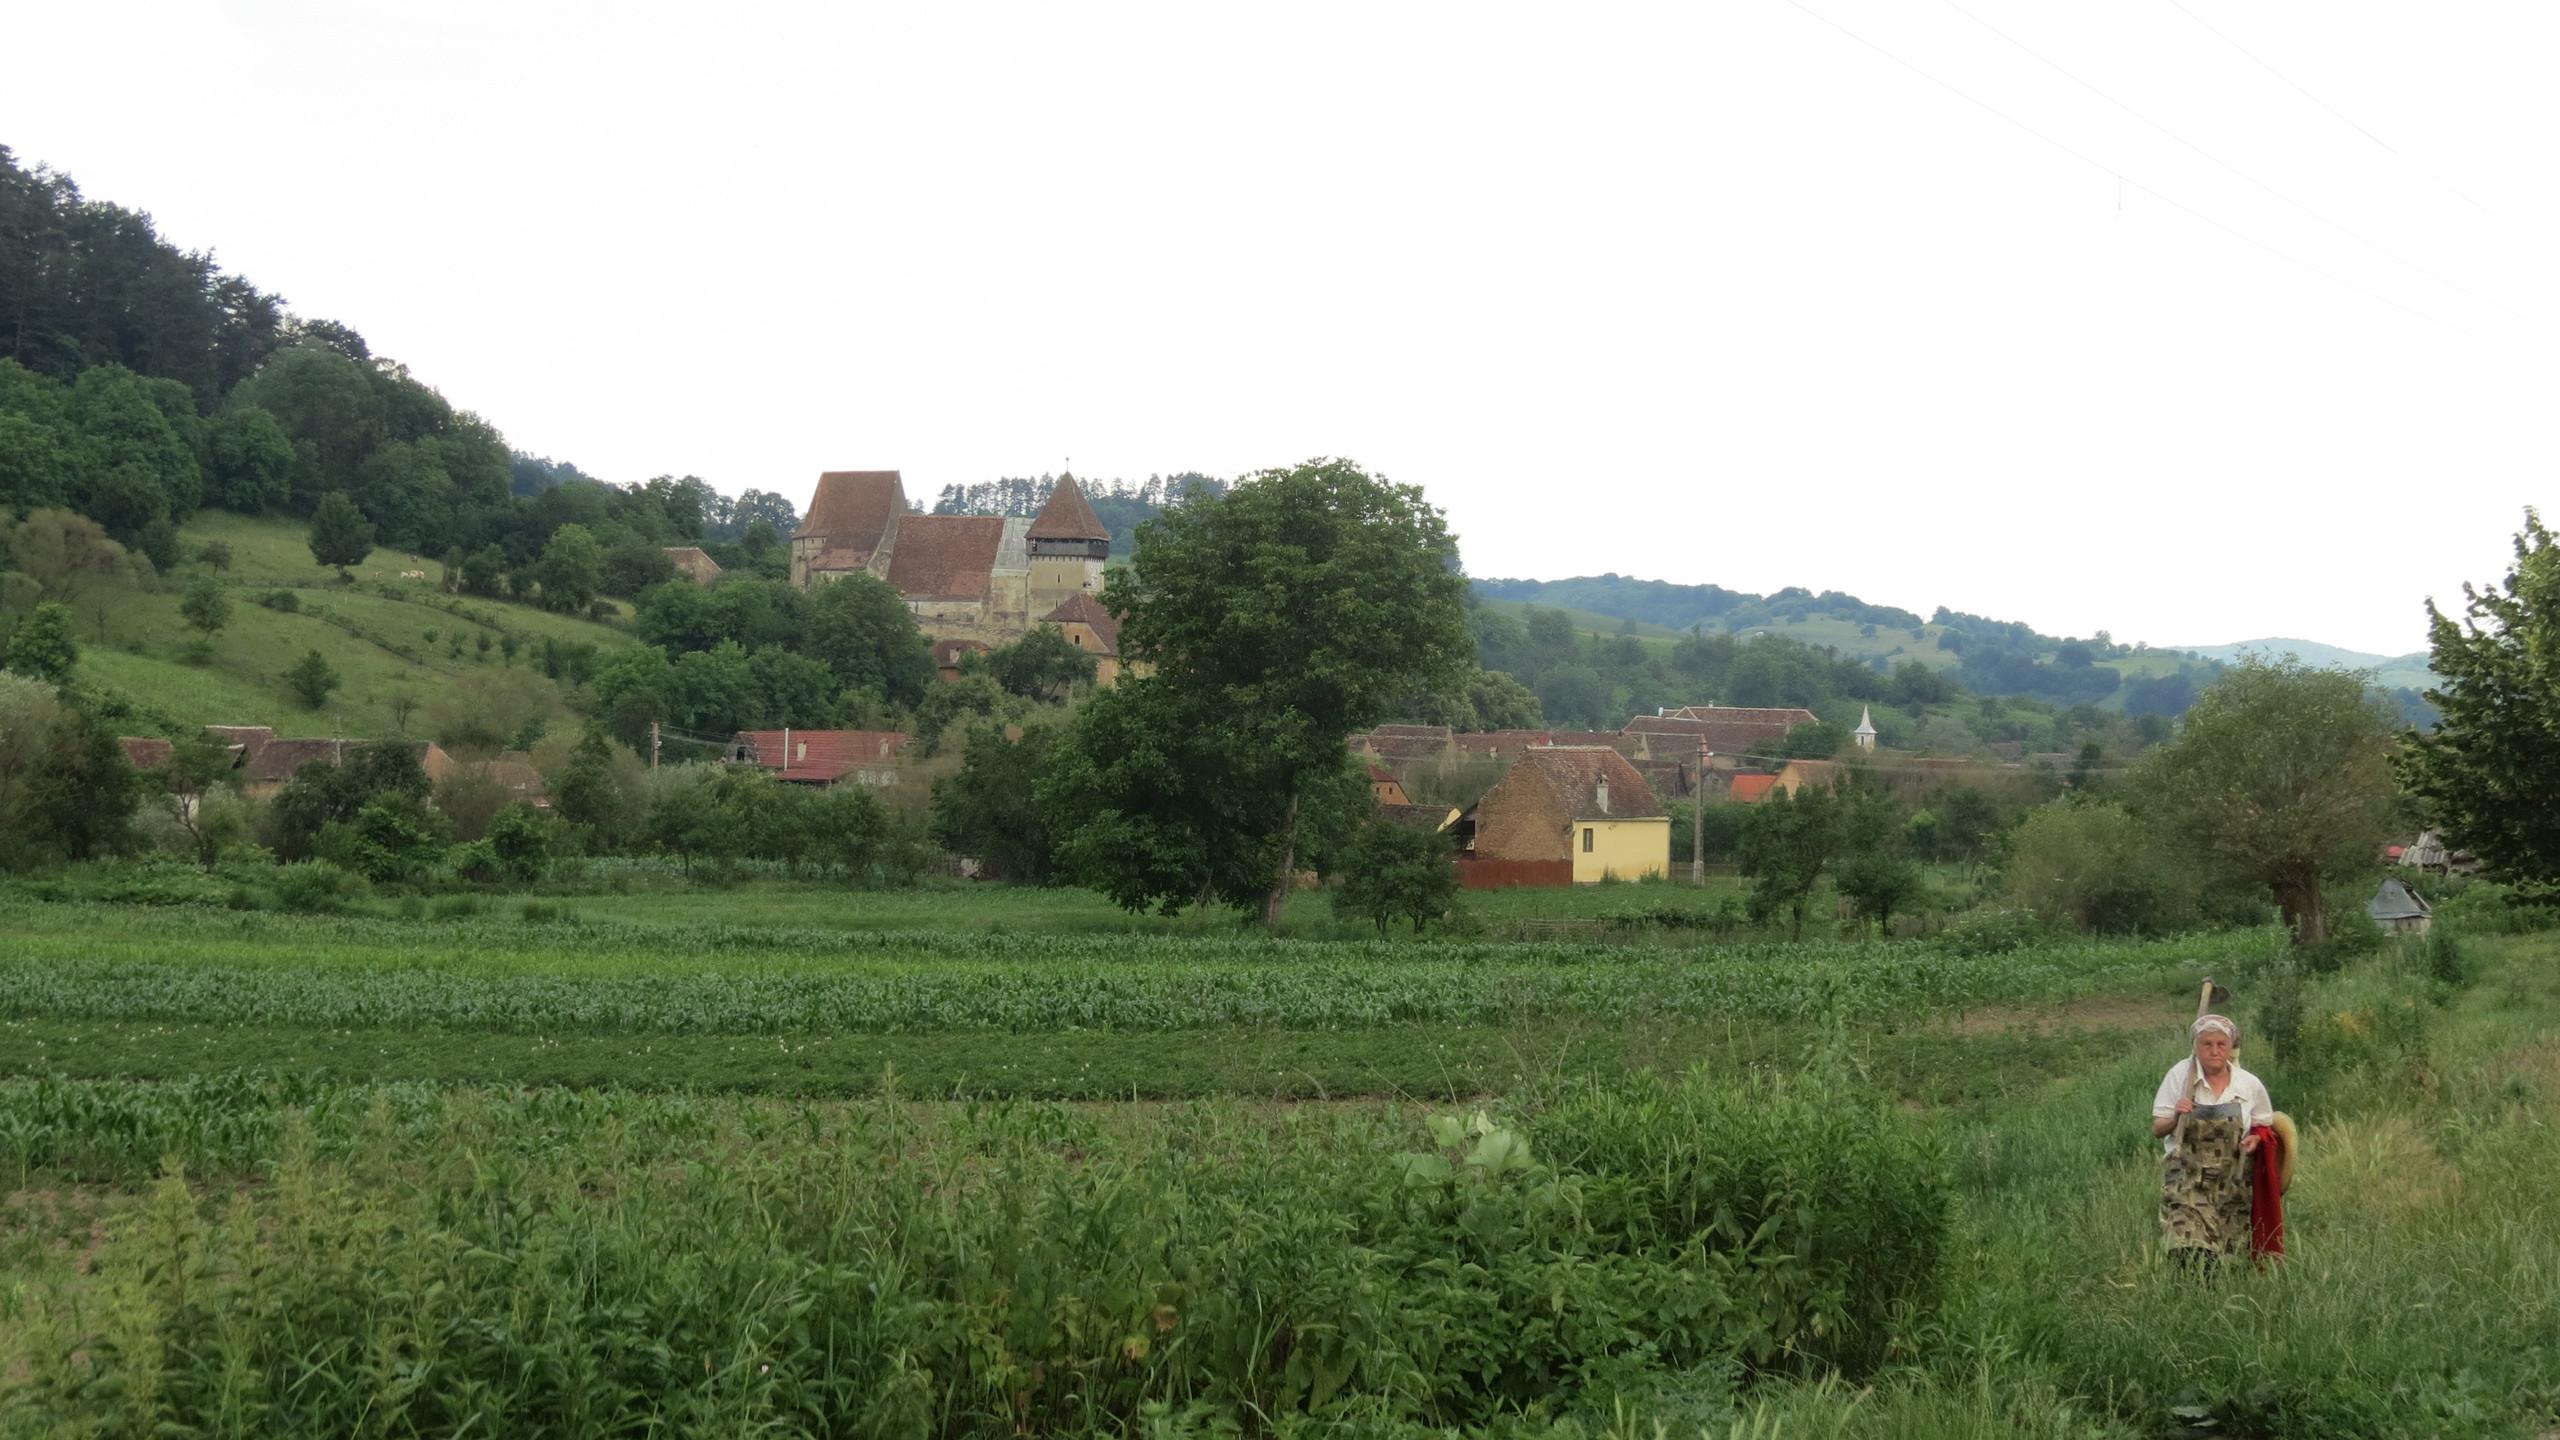 046_-_Copșa_Mare_fortified_church